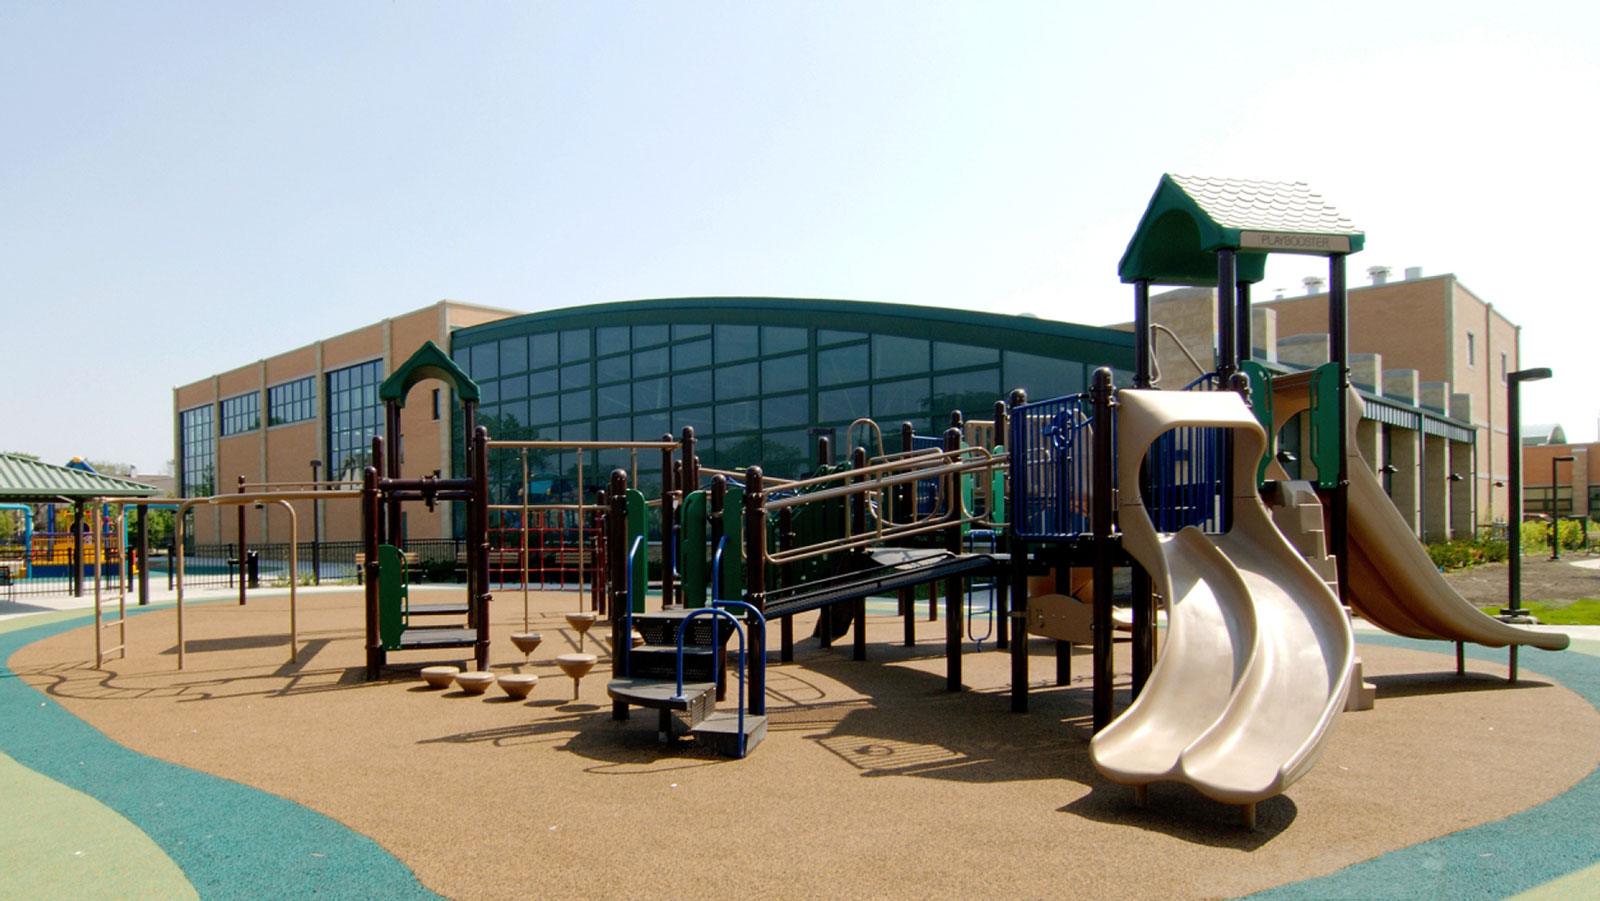 Fosco Park Facility Rehabilitation Pbc Chicago